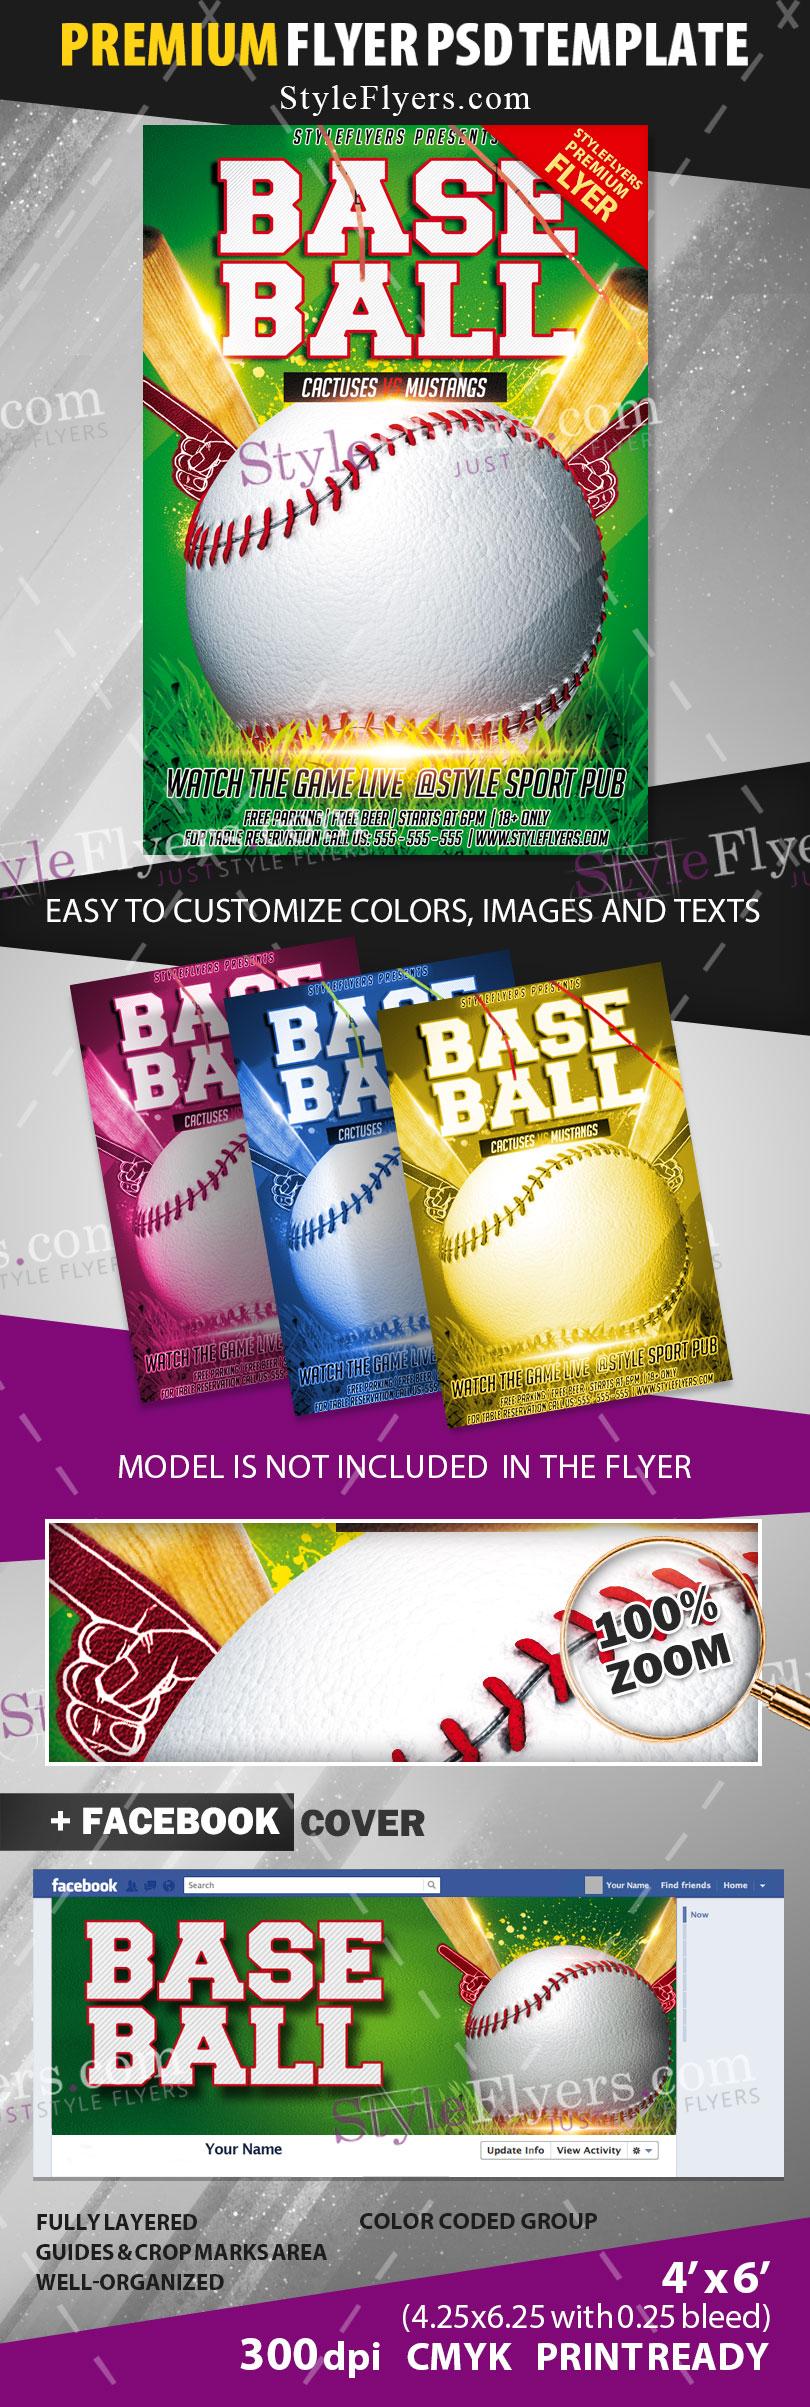 preview_premium_template_baseball